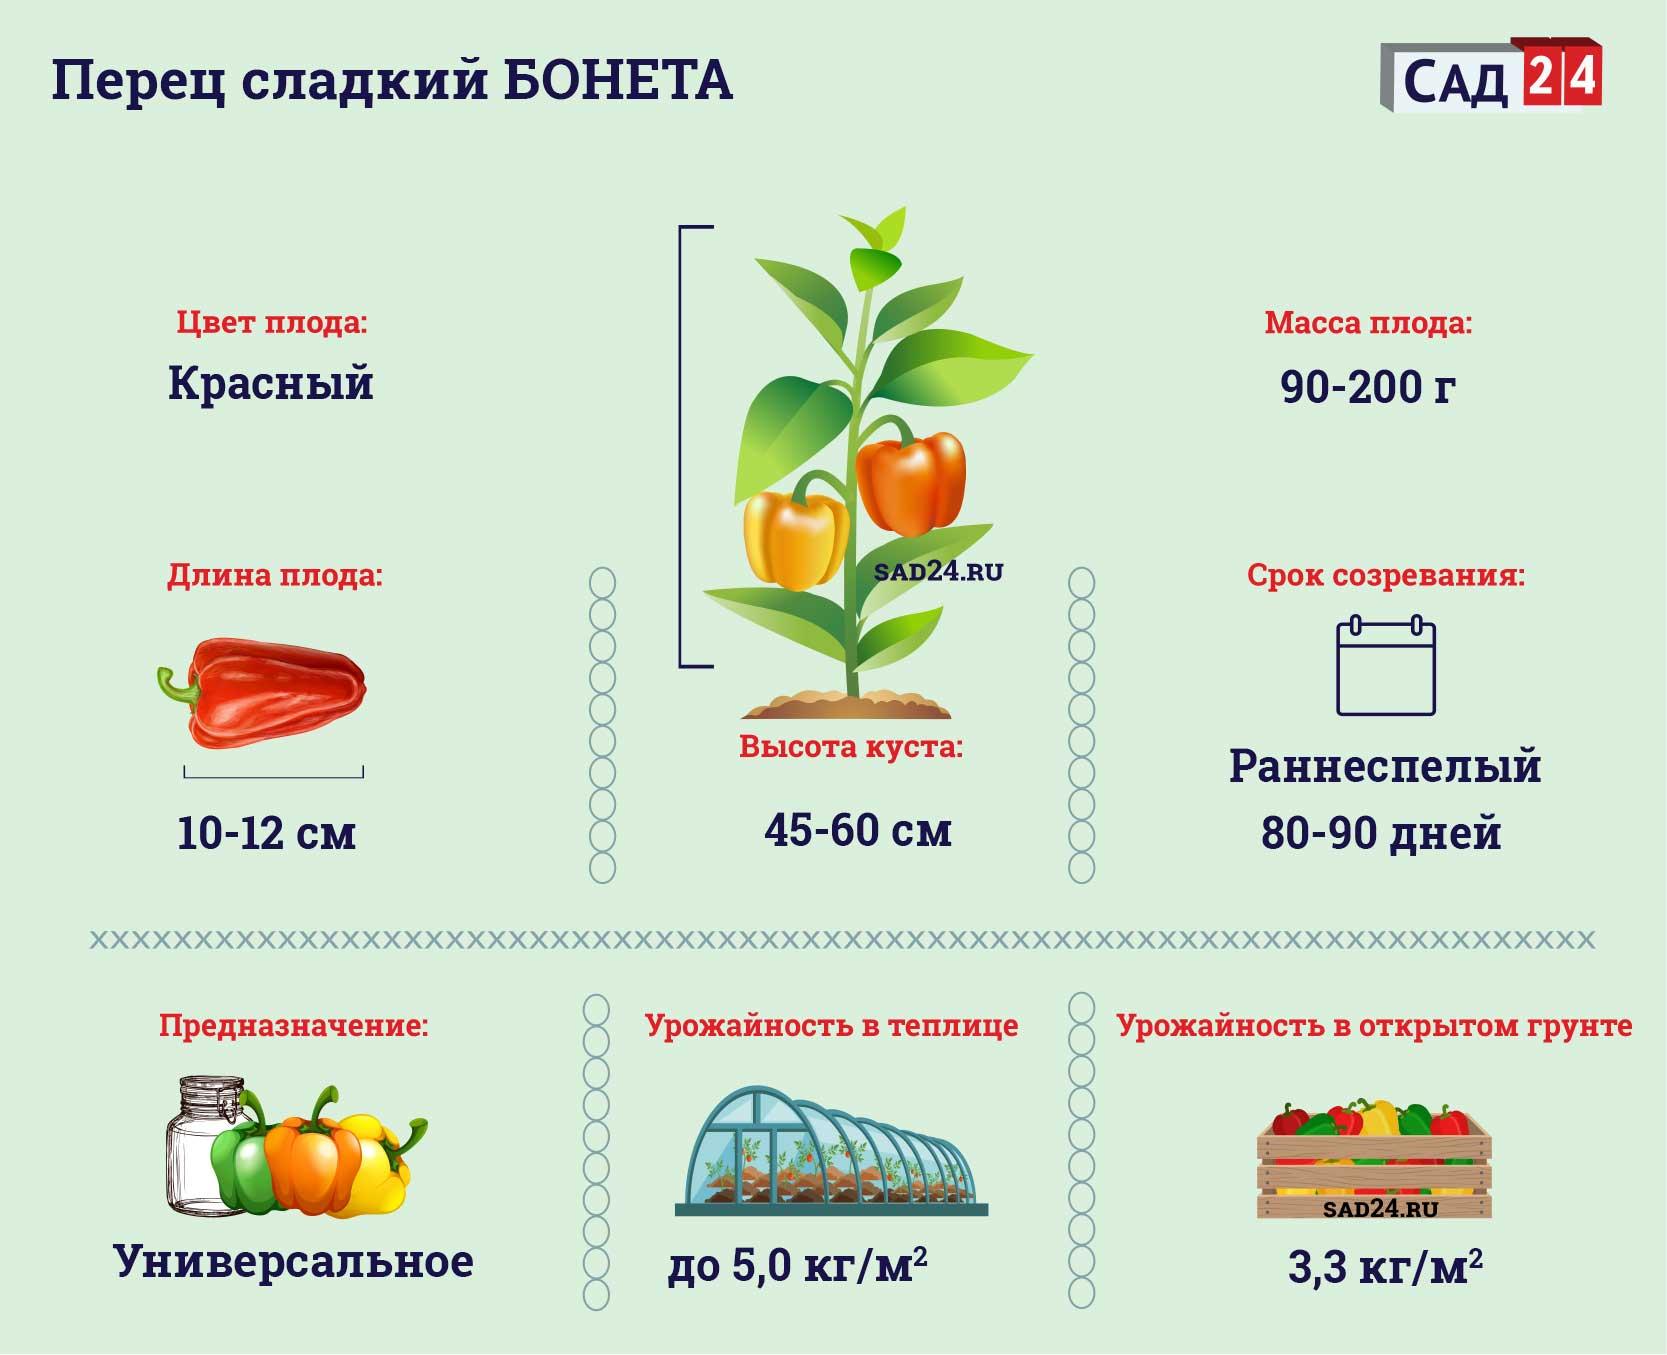 Бонета - https://sad24.ru